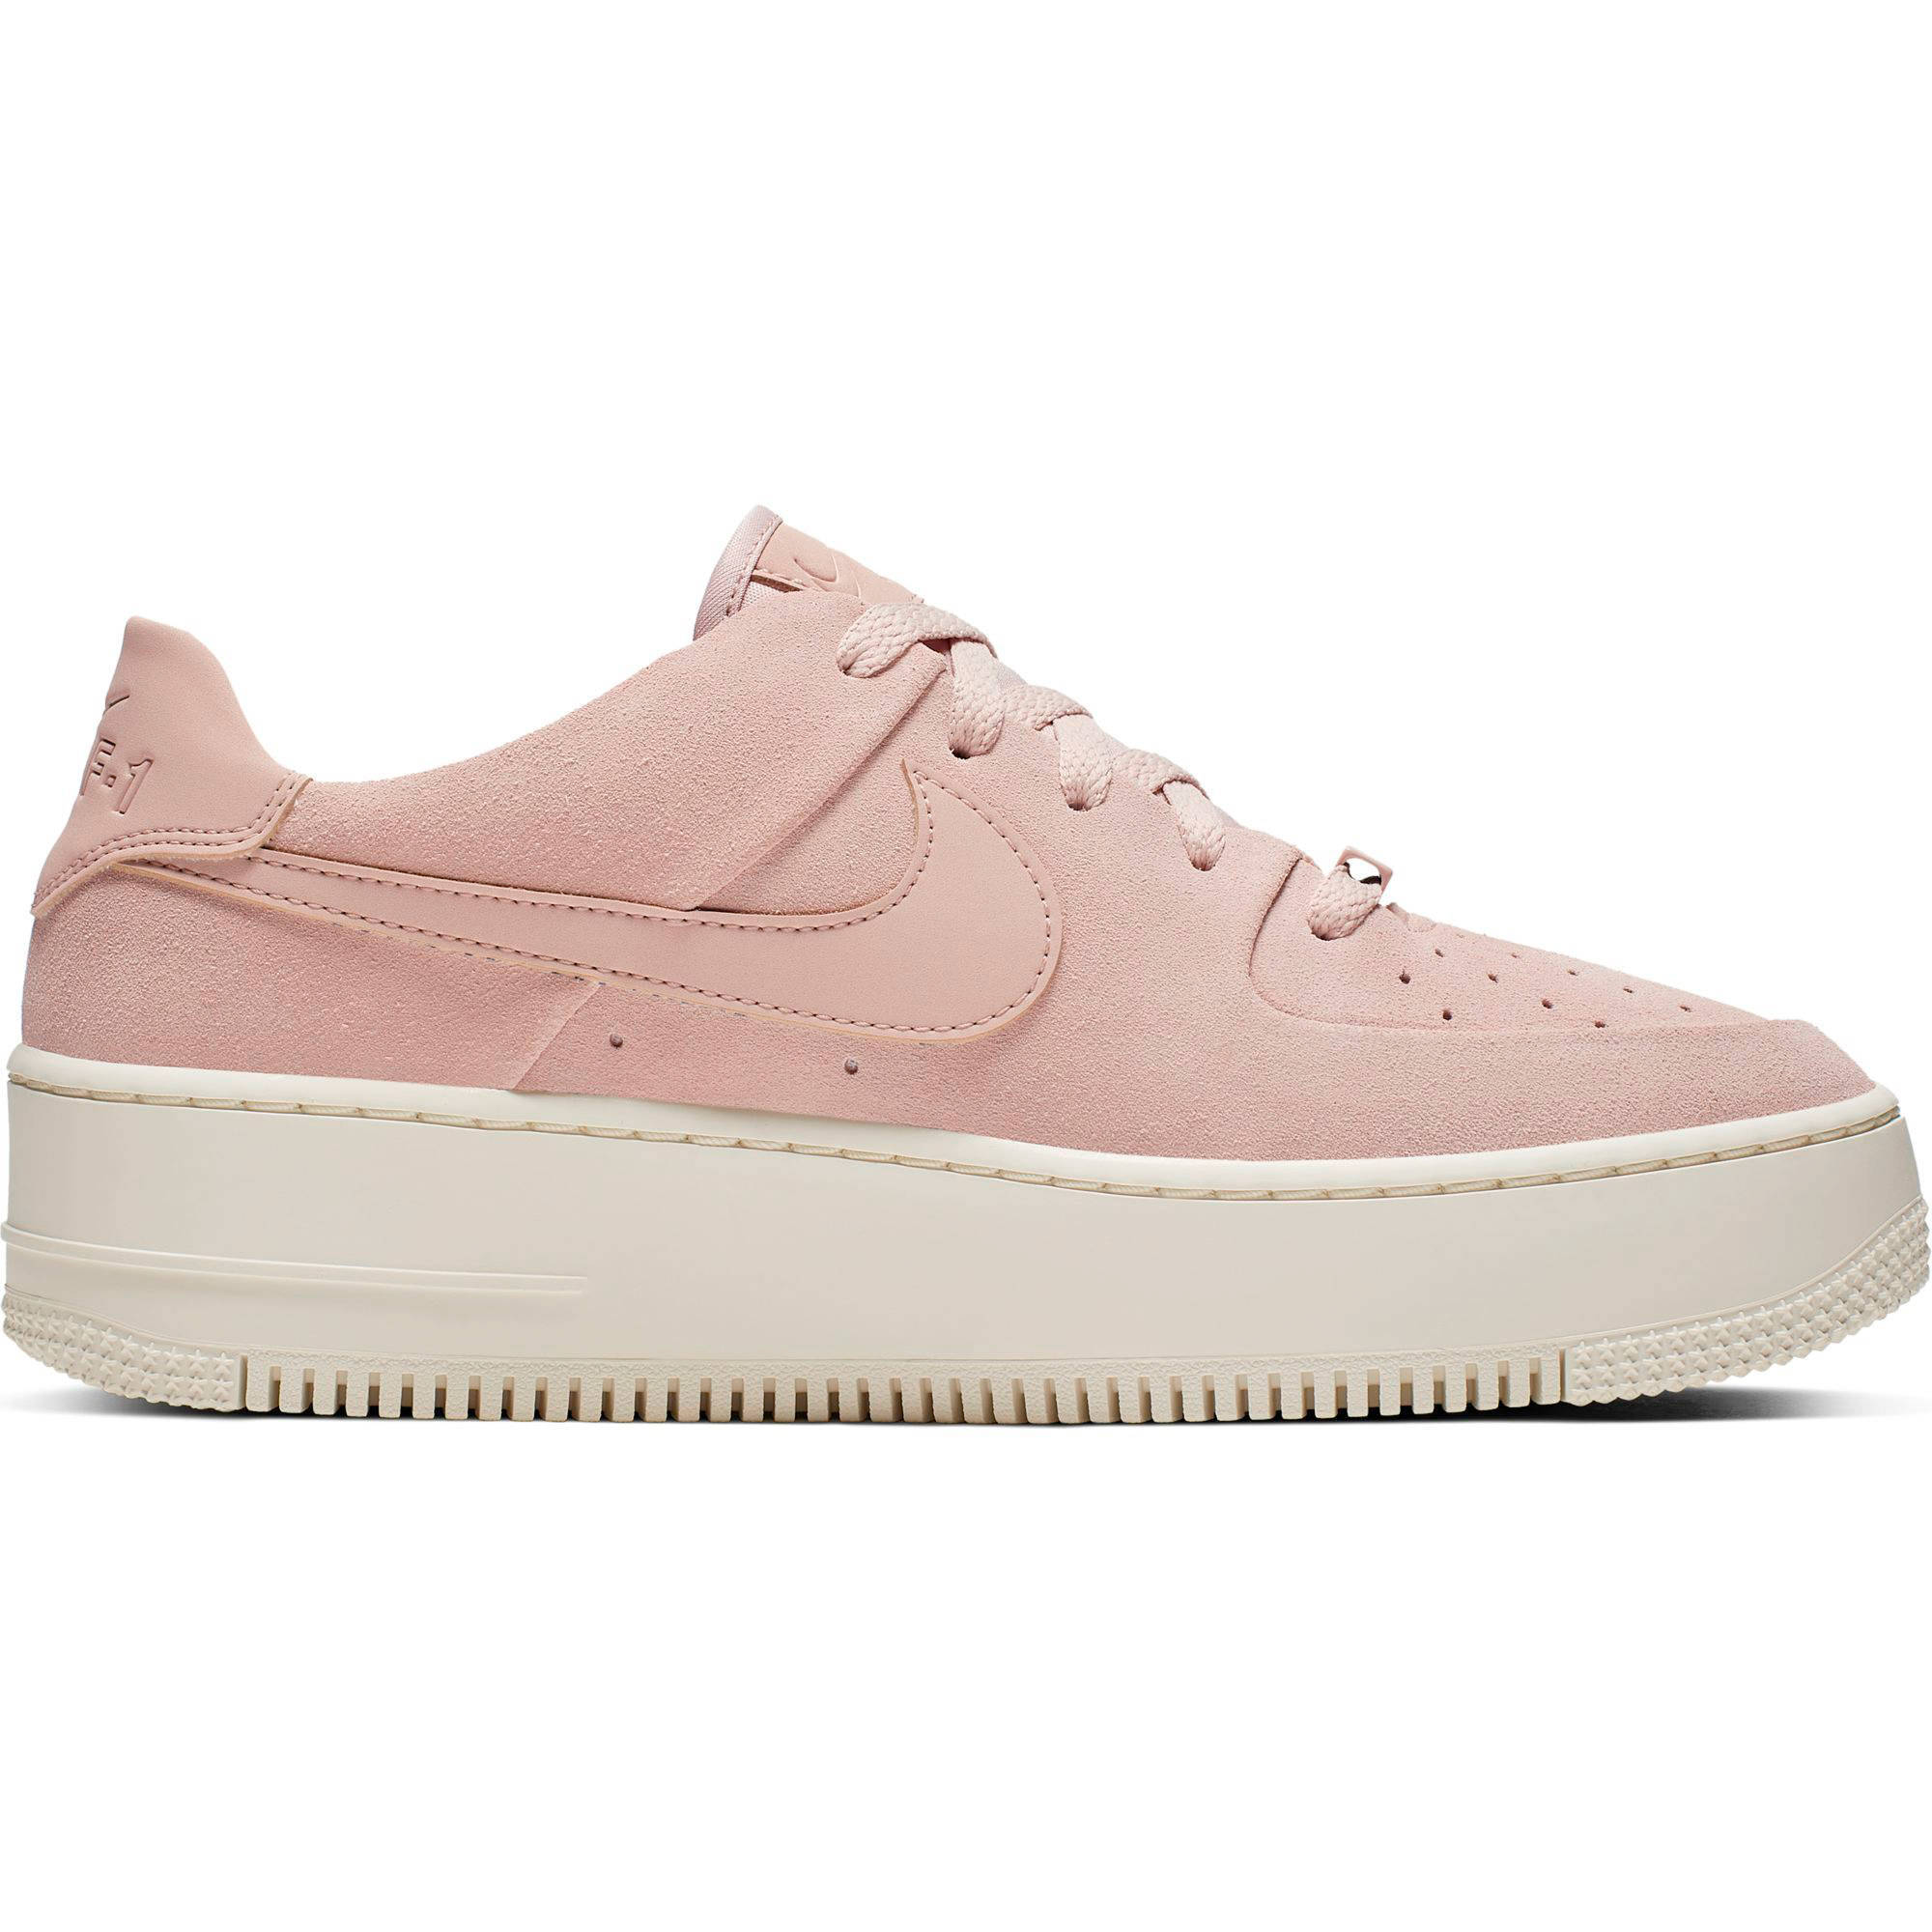 Nike Air Force 1 Sage Low plateau sneakers wit | wehkamp